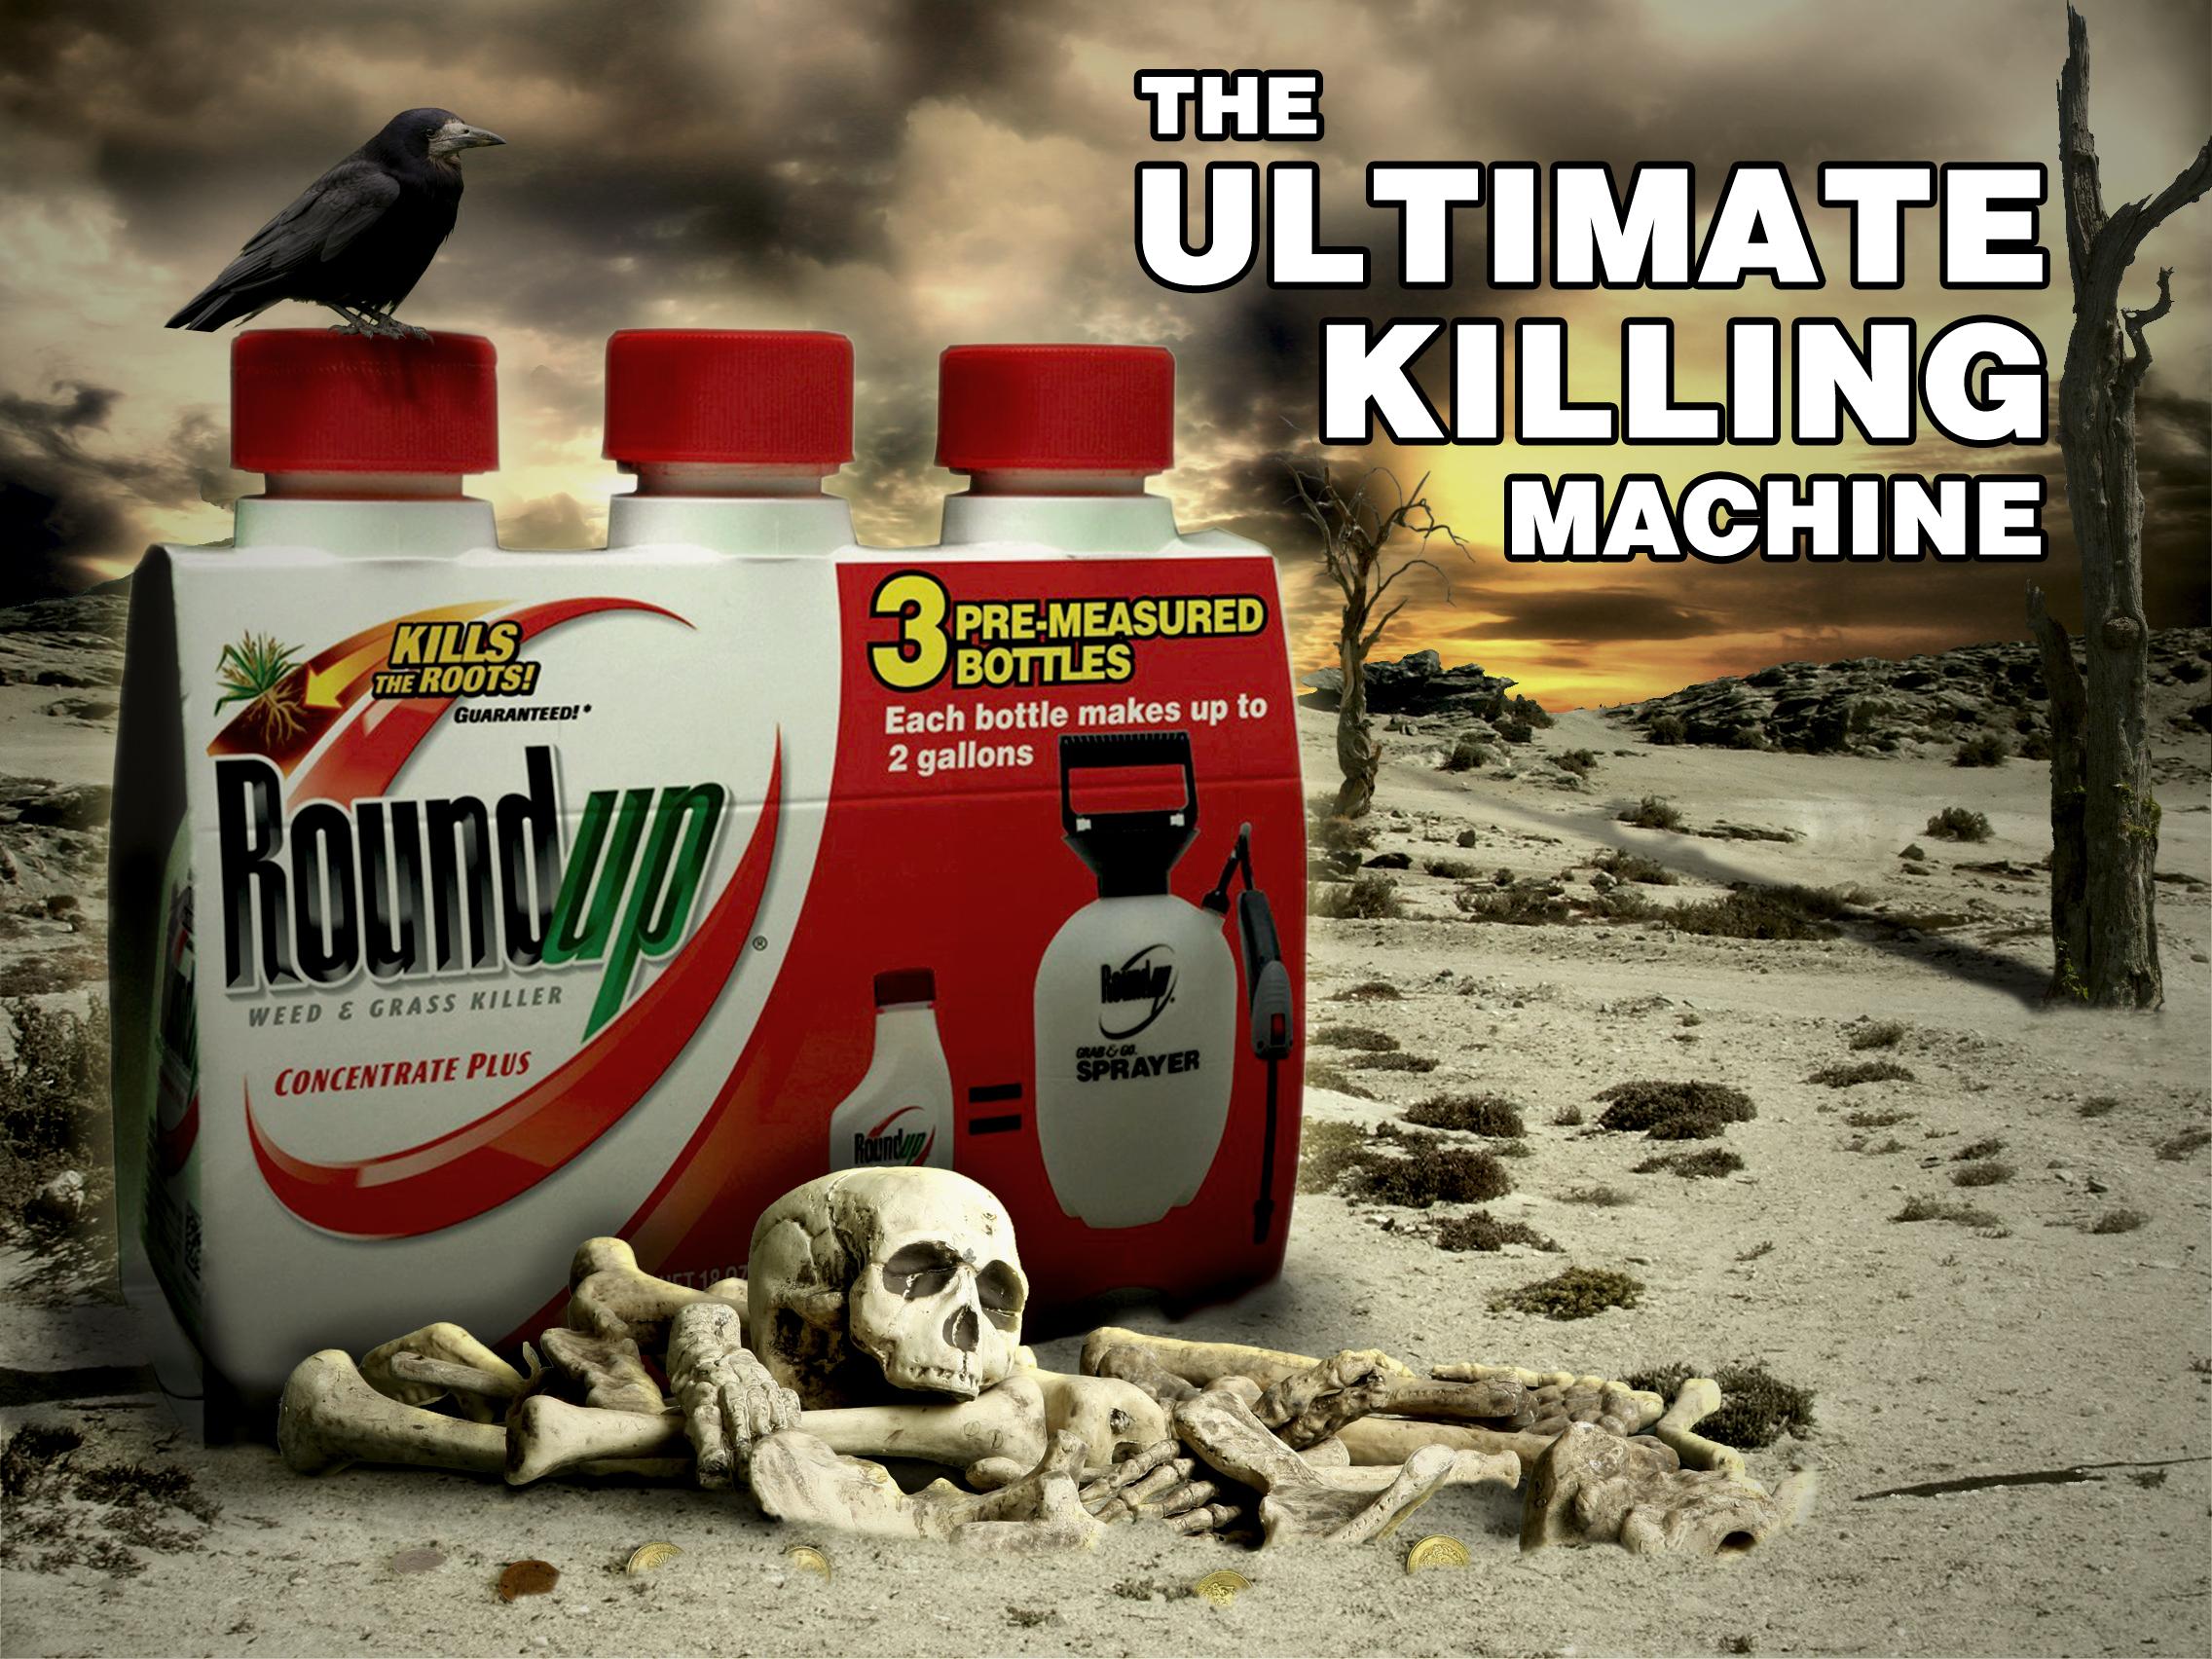 http://www.gmoevidence.com/wp-content/uploads/2013/11/death-ROUNDUP-2.jpg